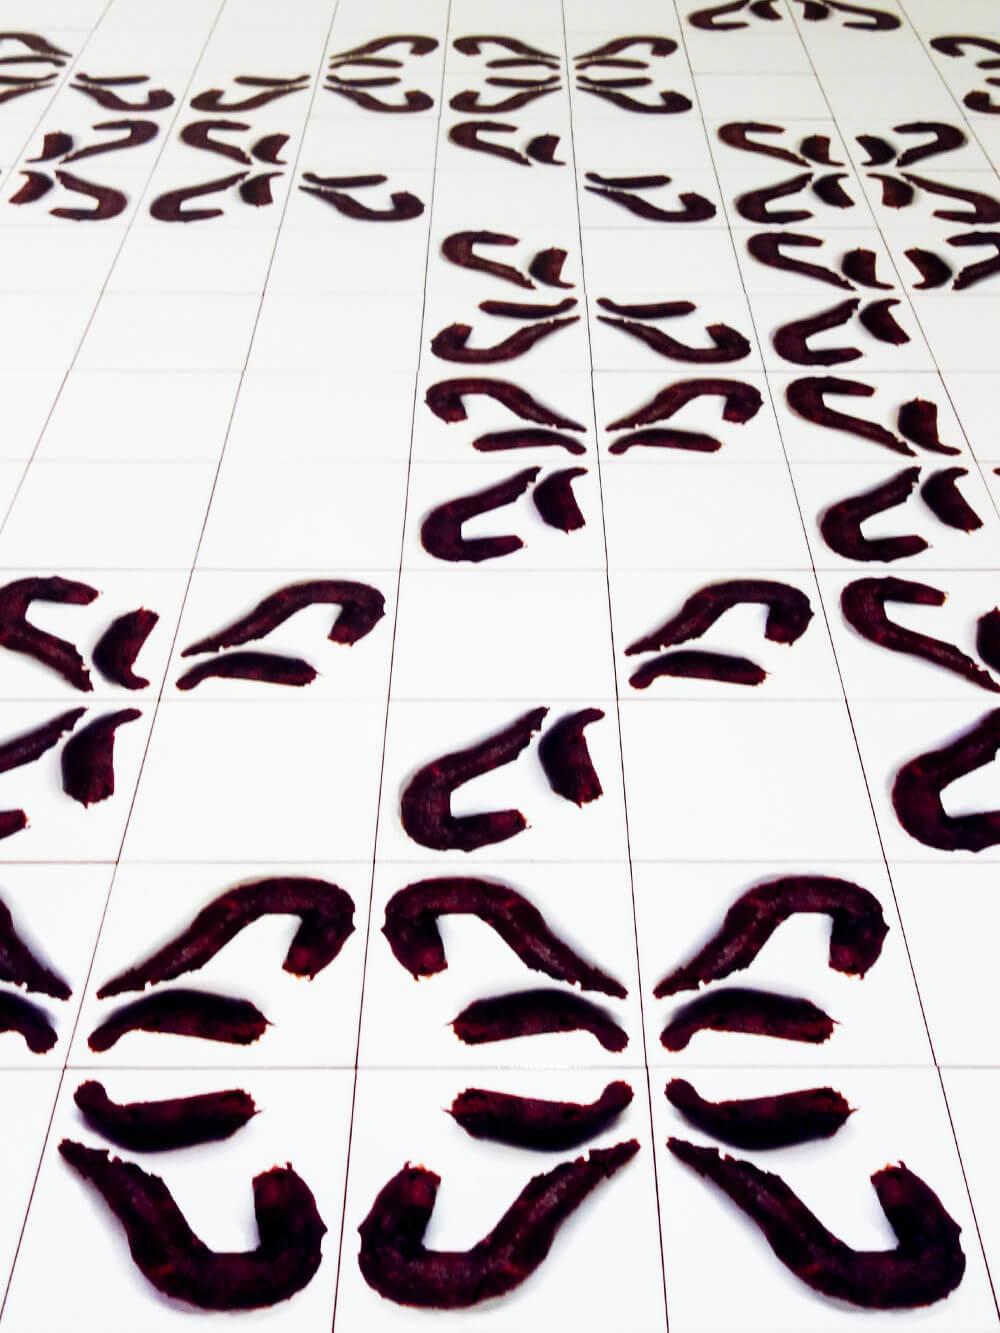 Mosaic 90-196-DEM 1990 Wim Delvoye Mudam Luxemburg